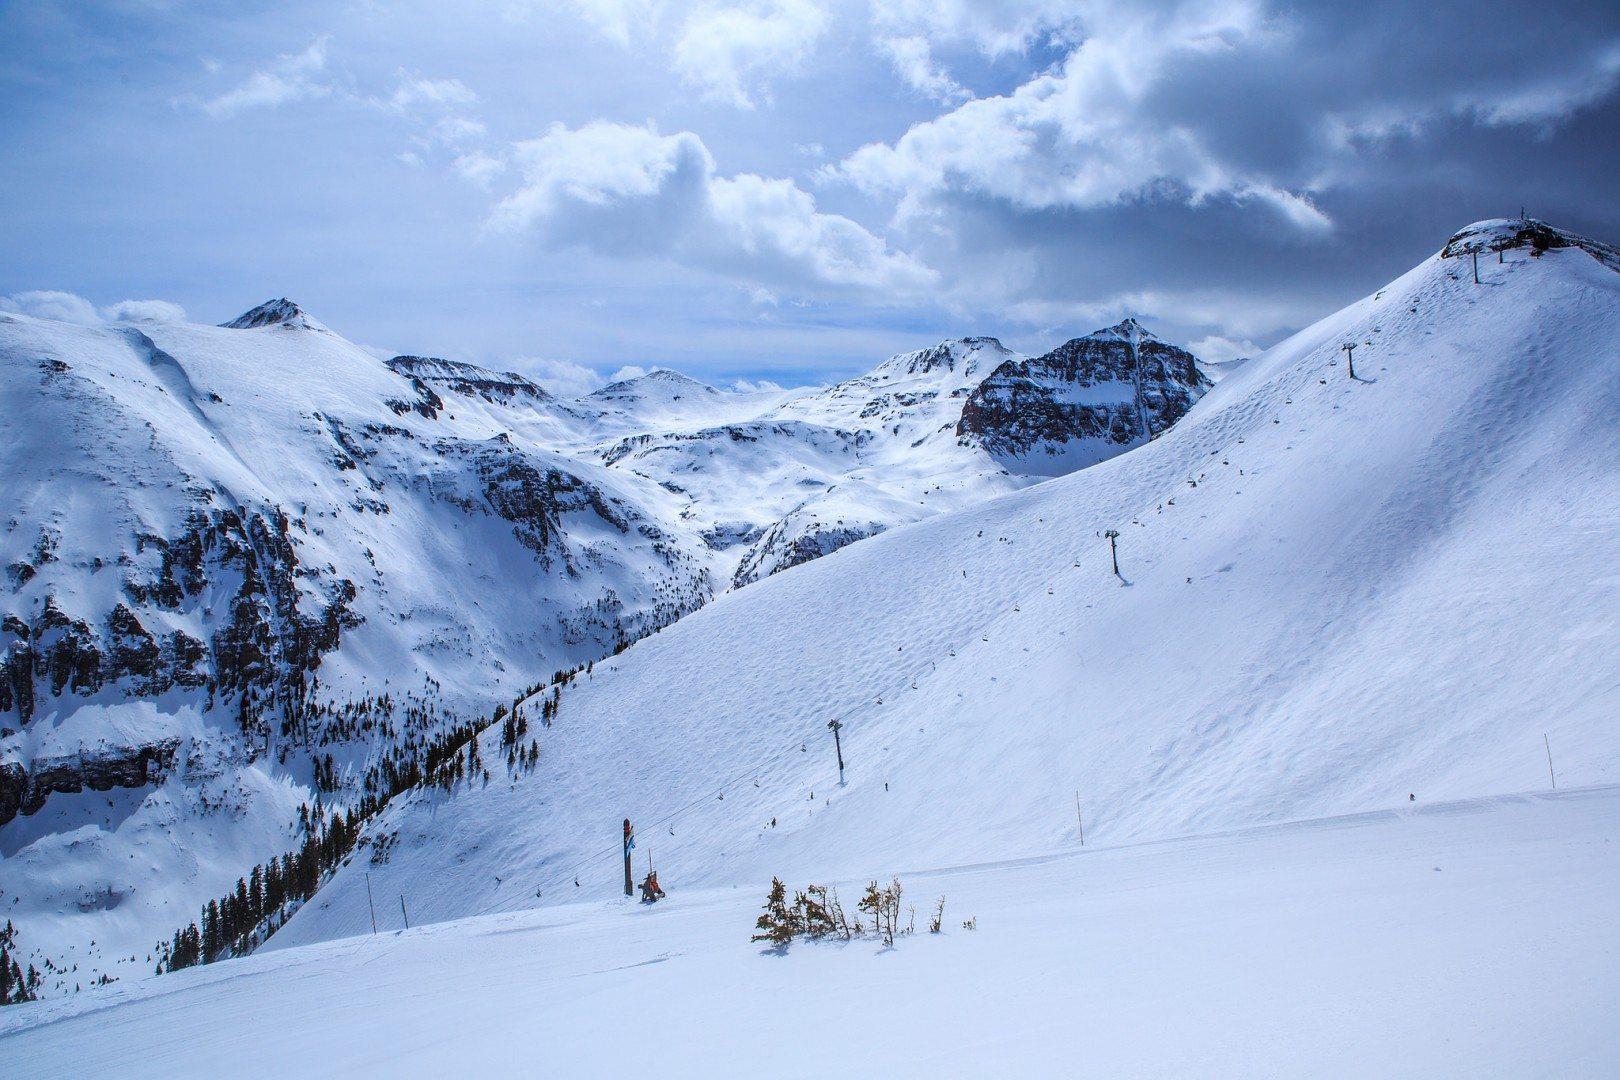 Telluride Ski Resort Photo Credit: Murray Foubister / Flickr